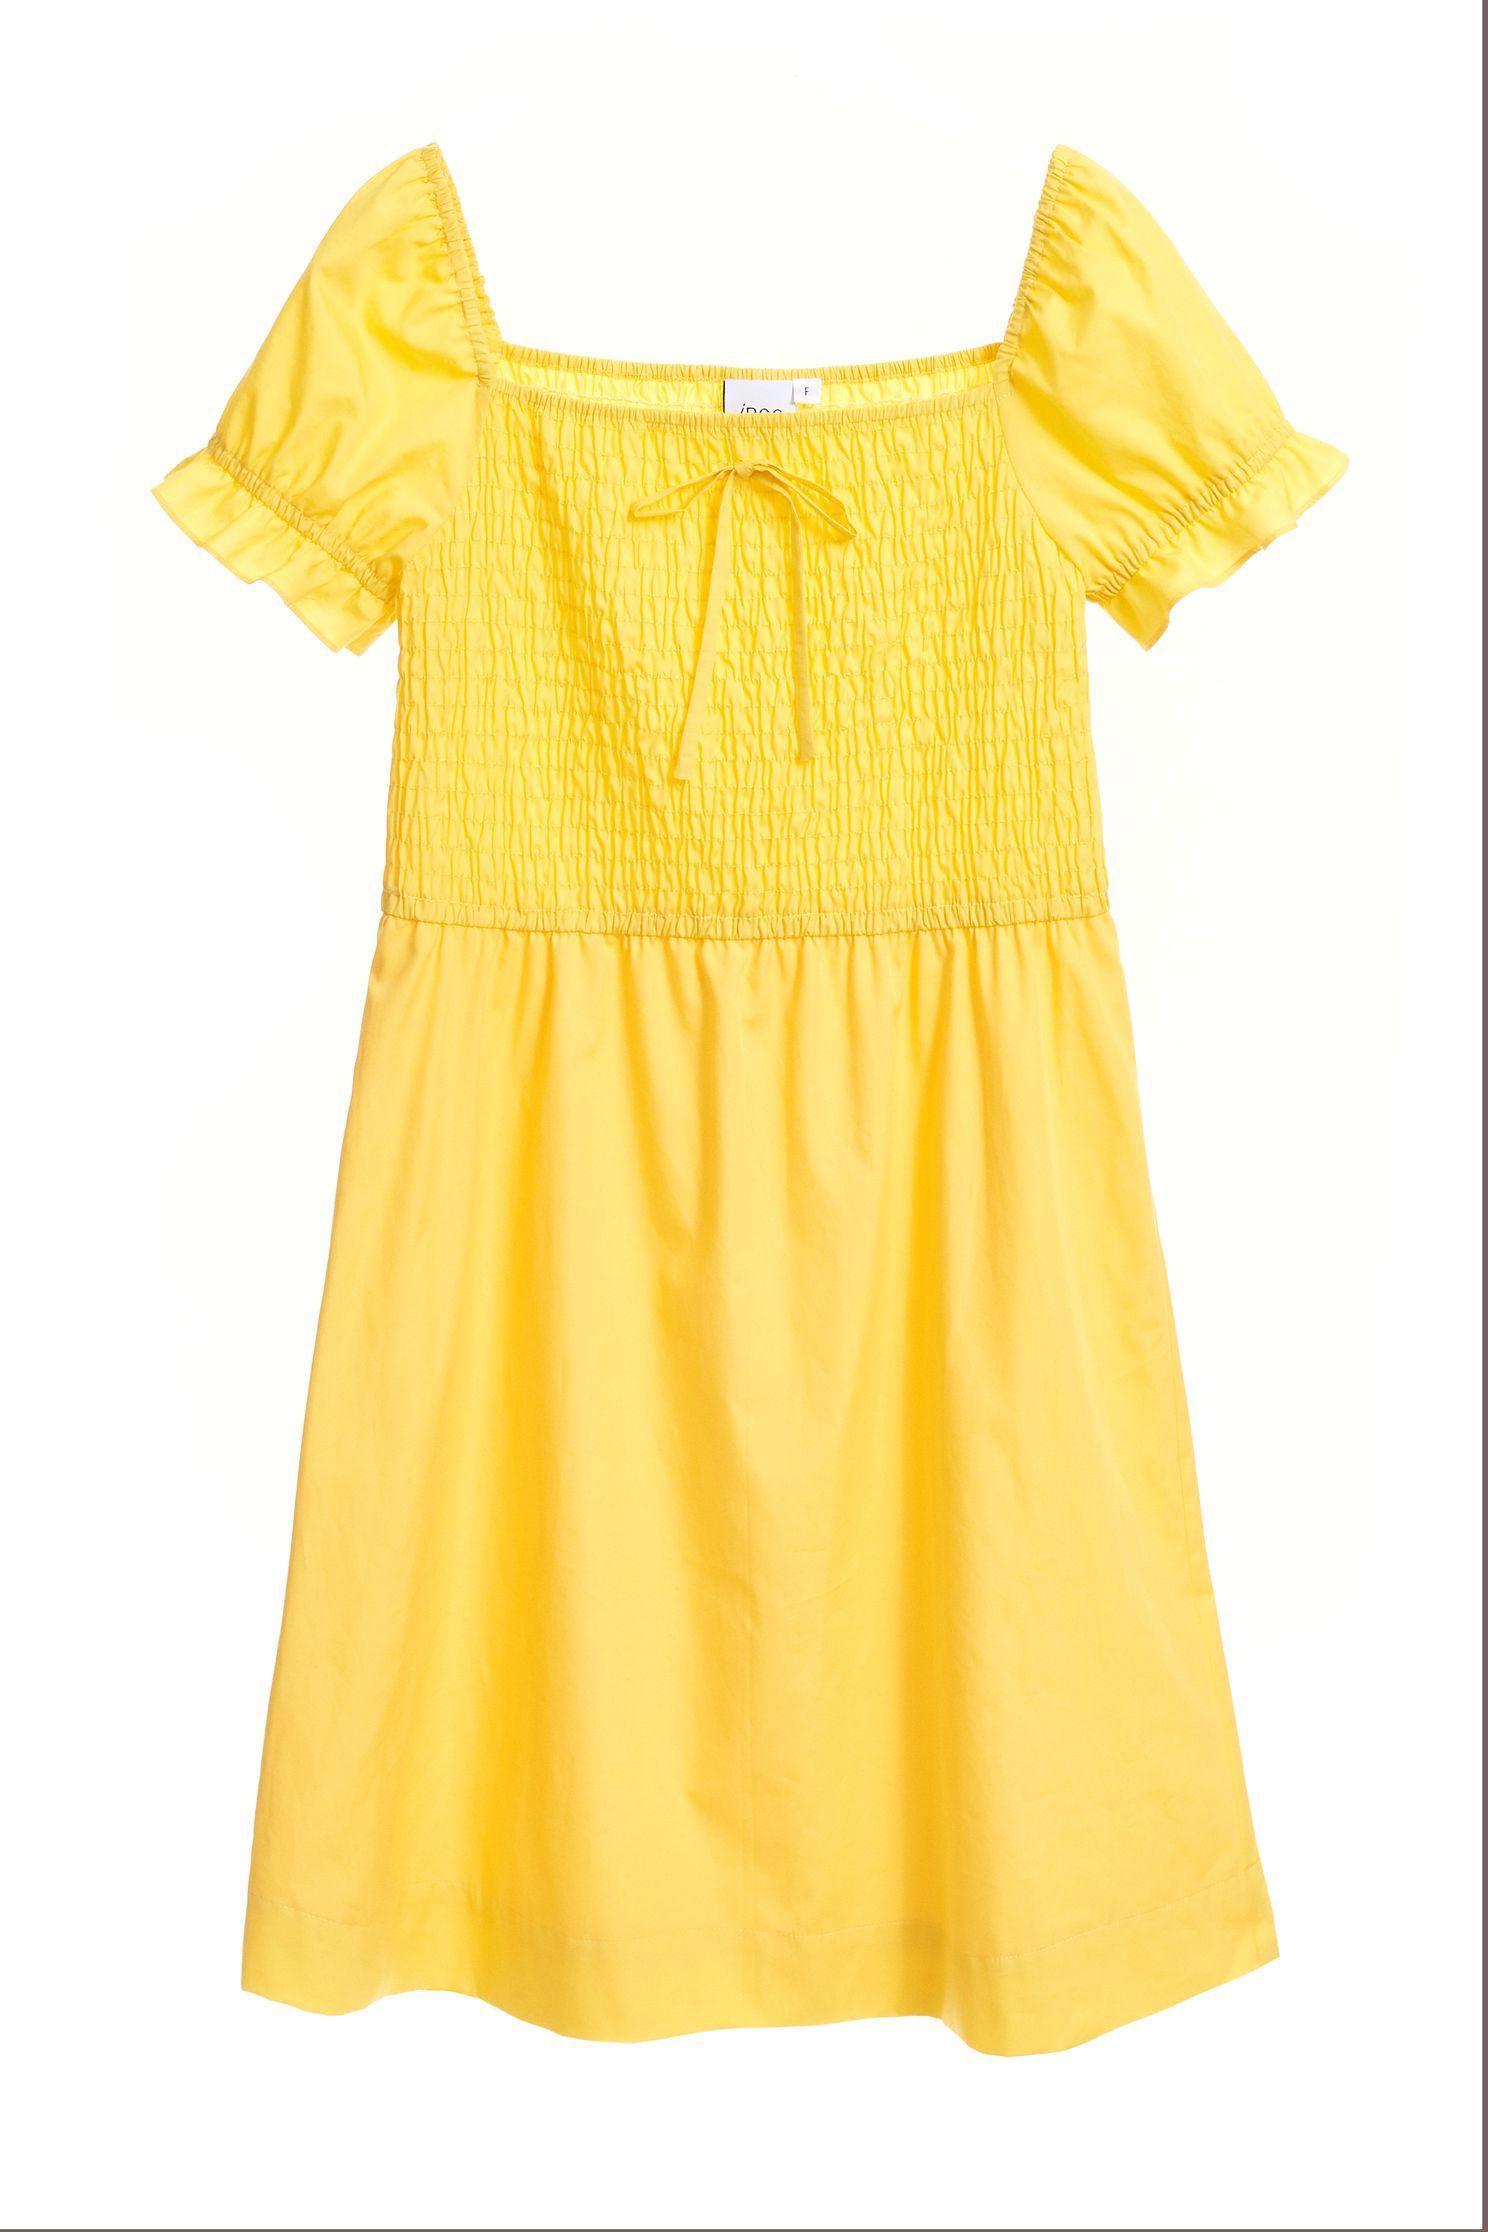 GATHERED elastic bright dress